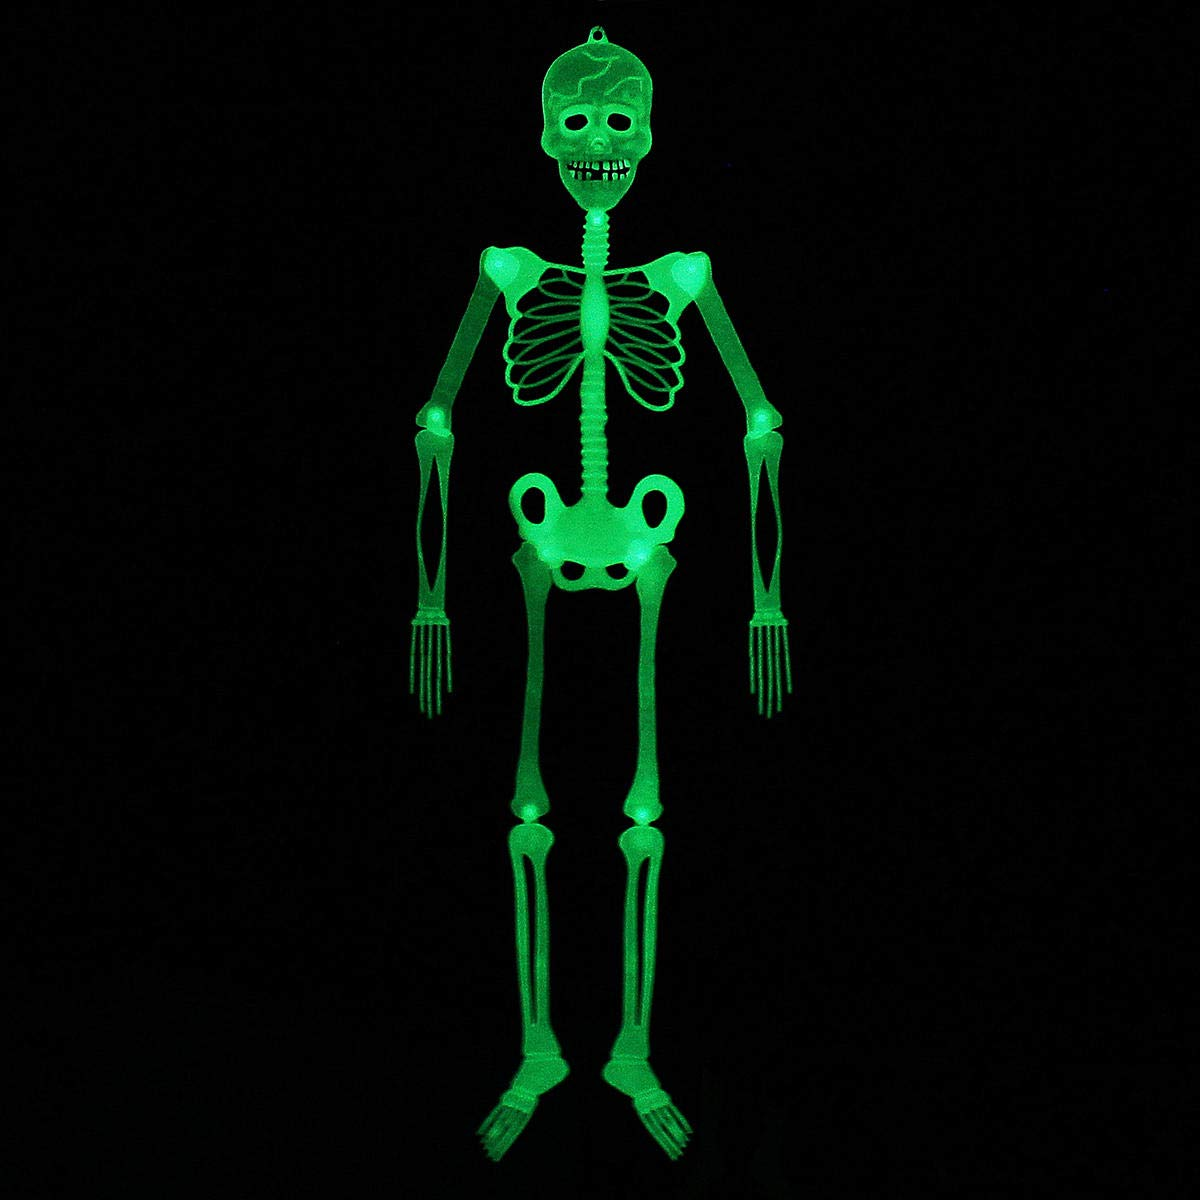 Halloween Luminou Human Skeleton Decoration Classroom Occasionally Adjustable - 1PCs by Unknown (Image #3)